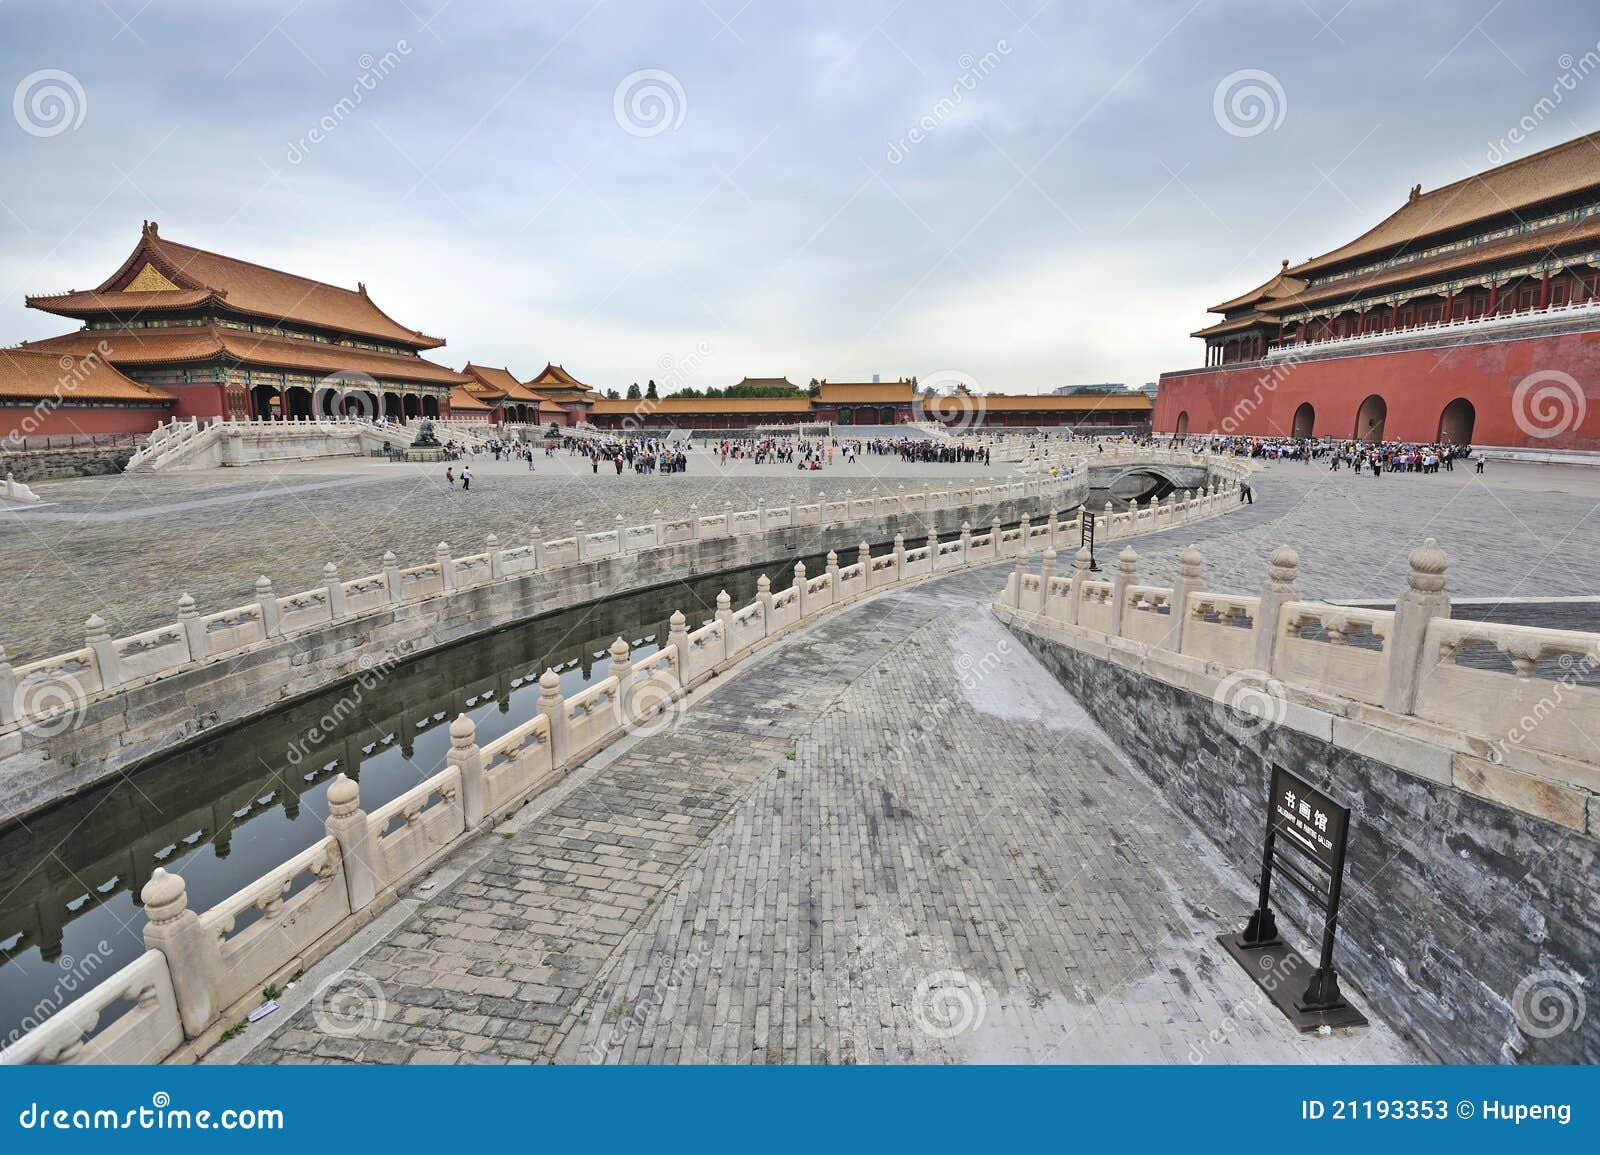 The Forbidden City (Gu Gong)